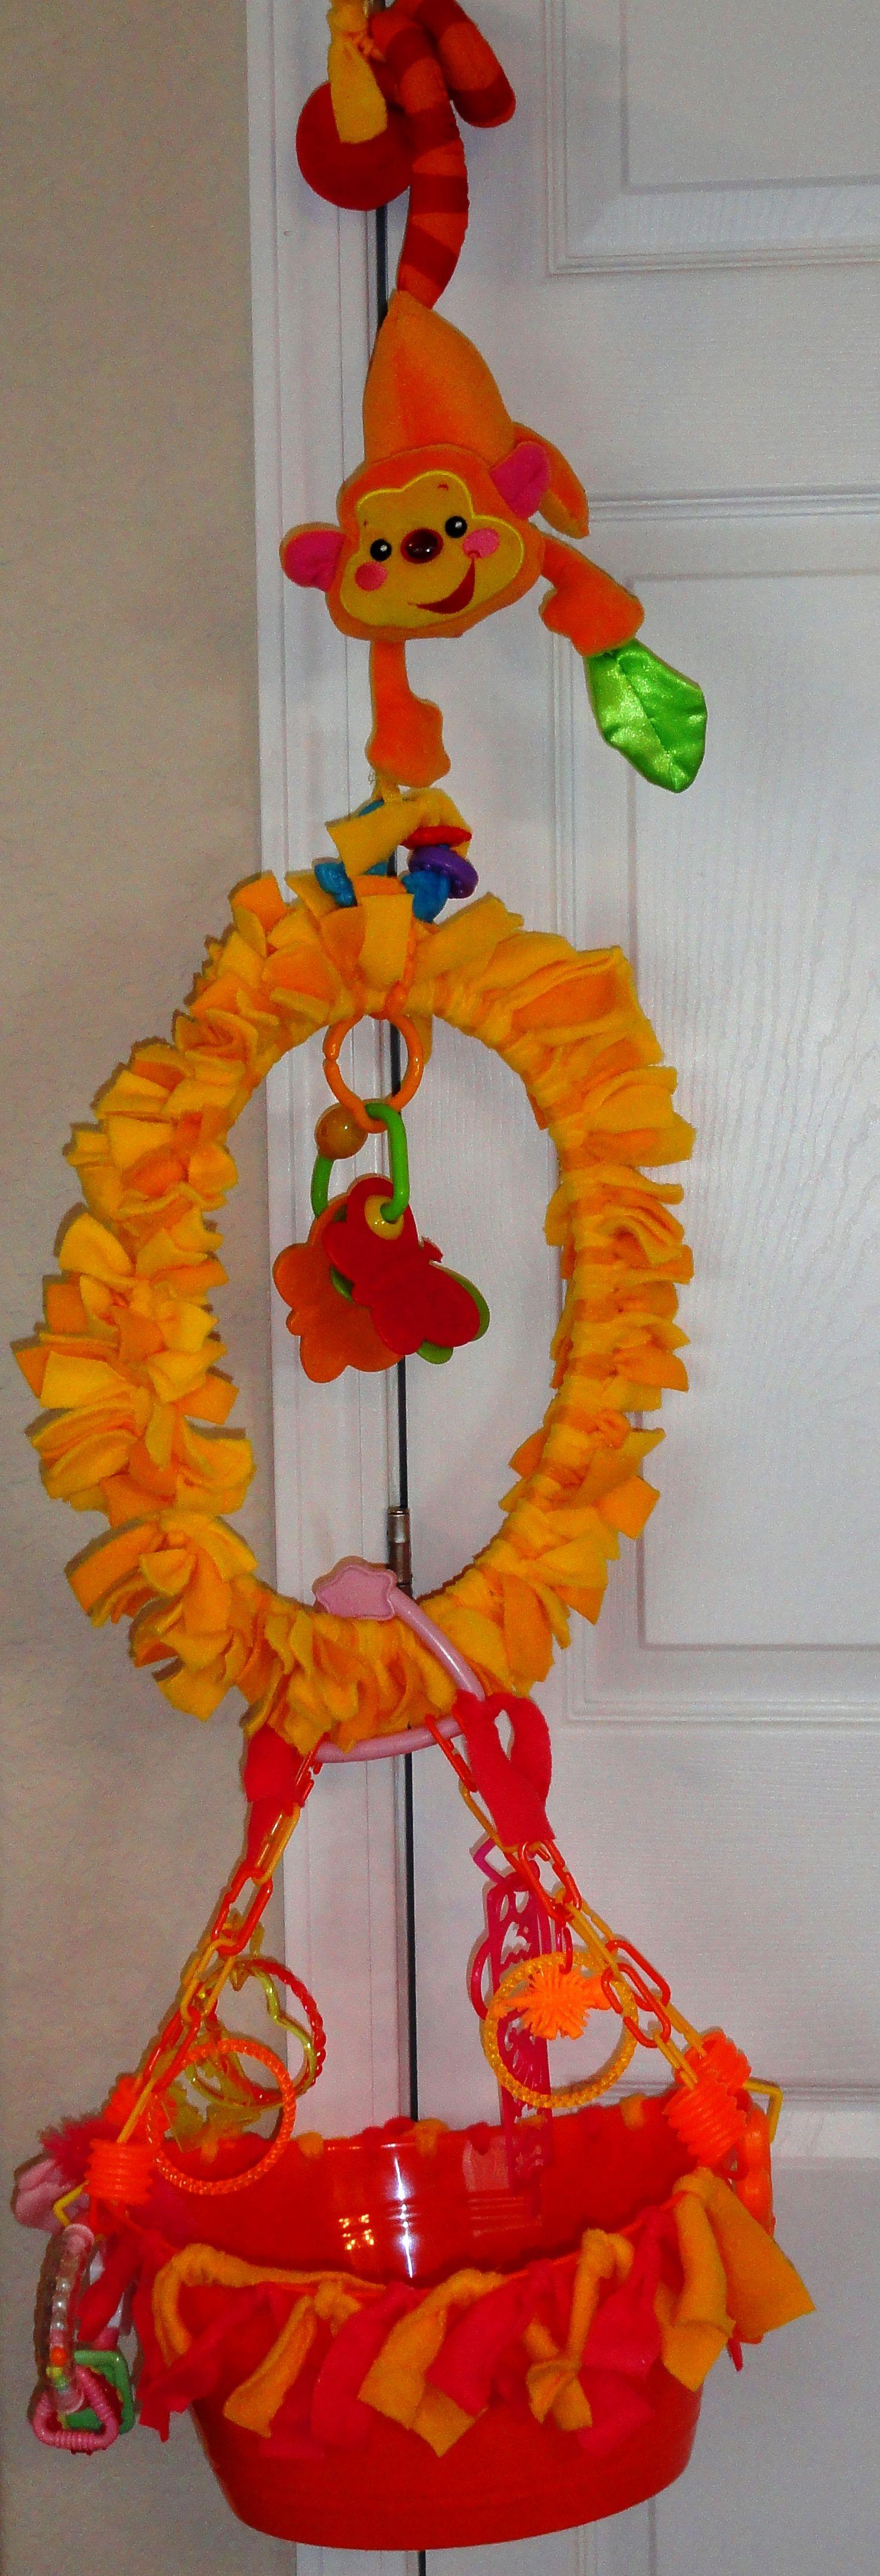 A hoop hanger swing play bucket diy stuffed animals